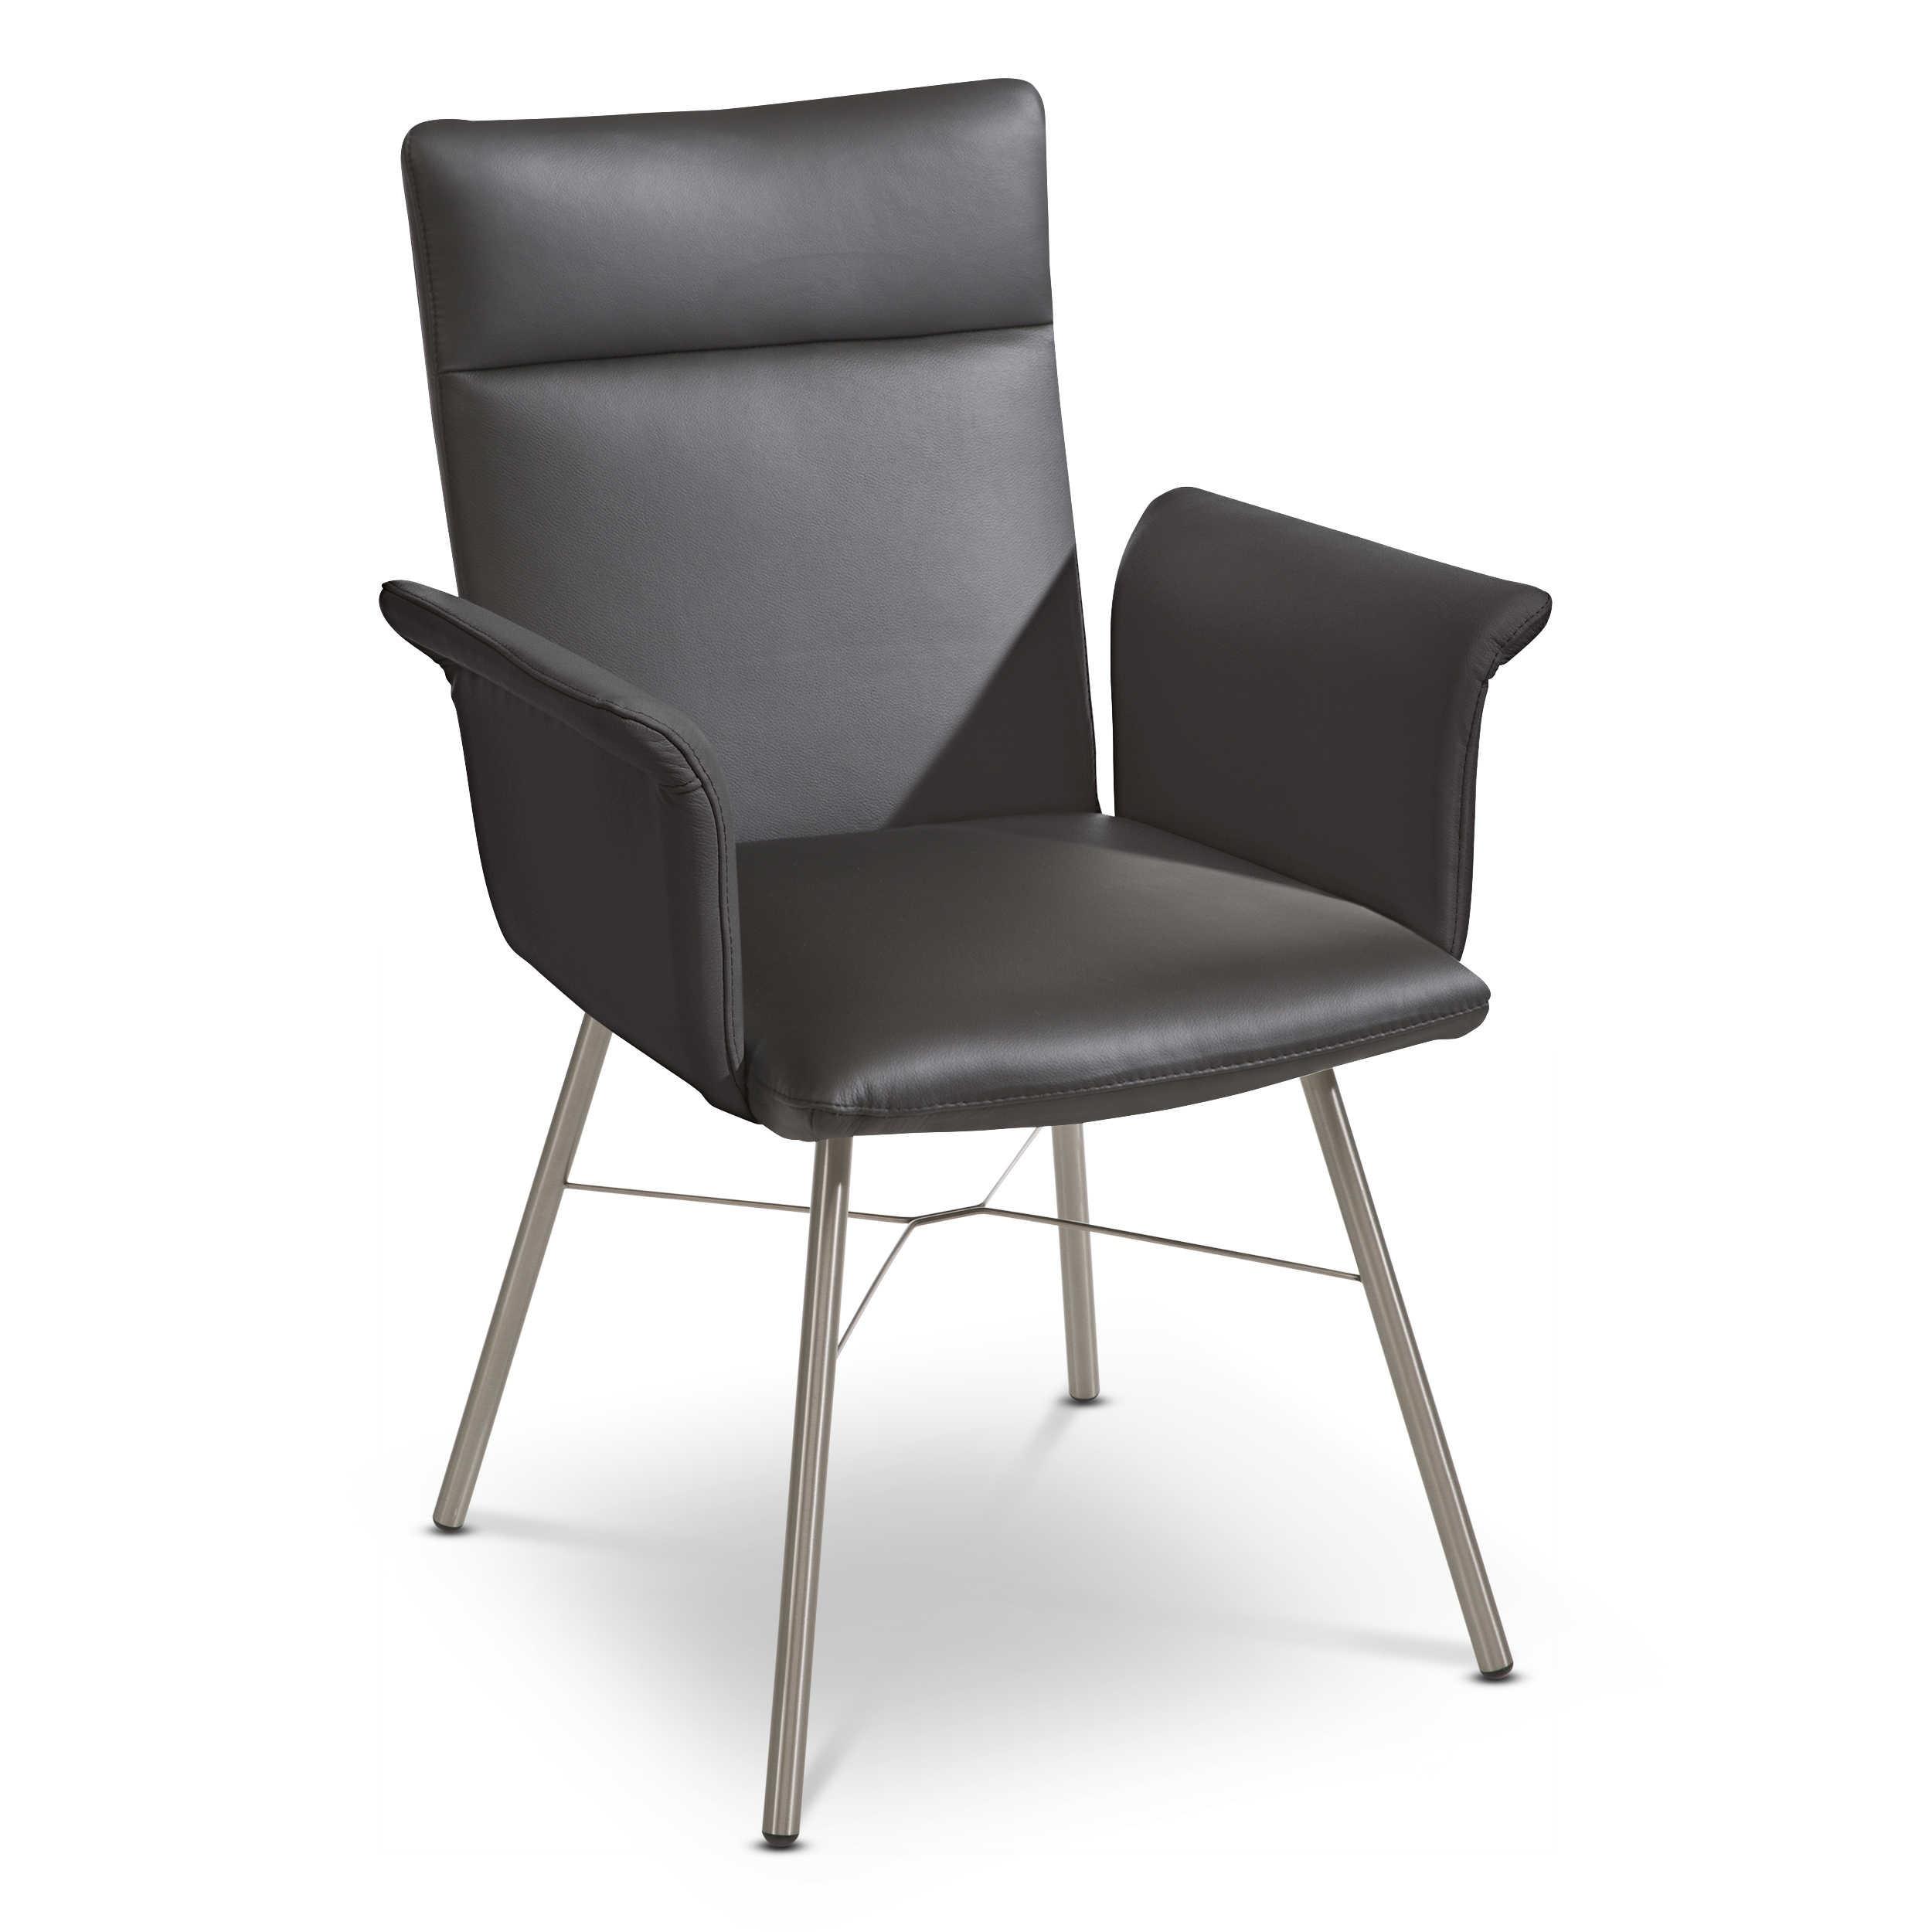 stuhl venedig schwarz leder online kaufen bei woonio. Black Bedroom Furniture Sets. Home Design Ideas